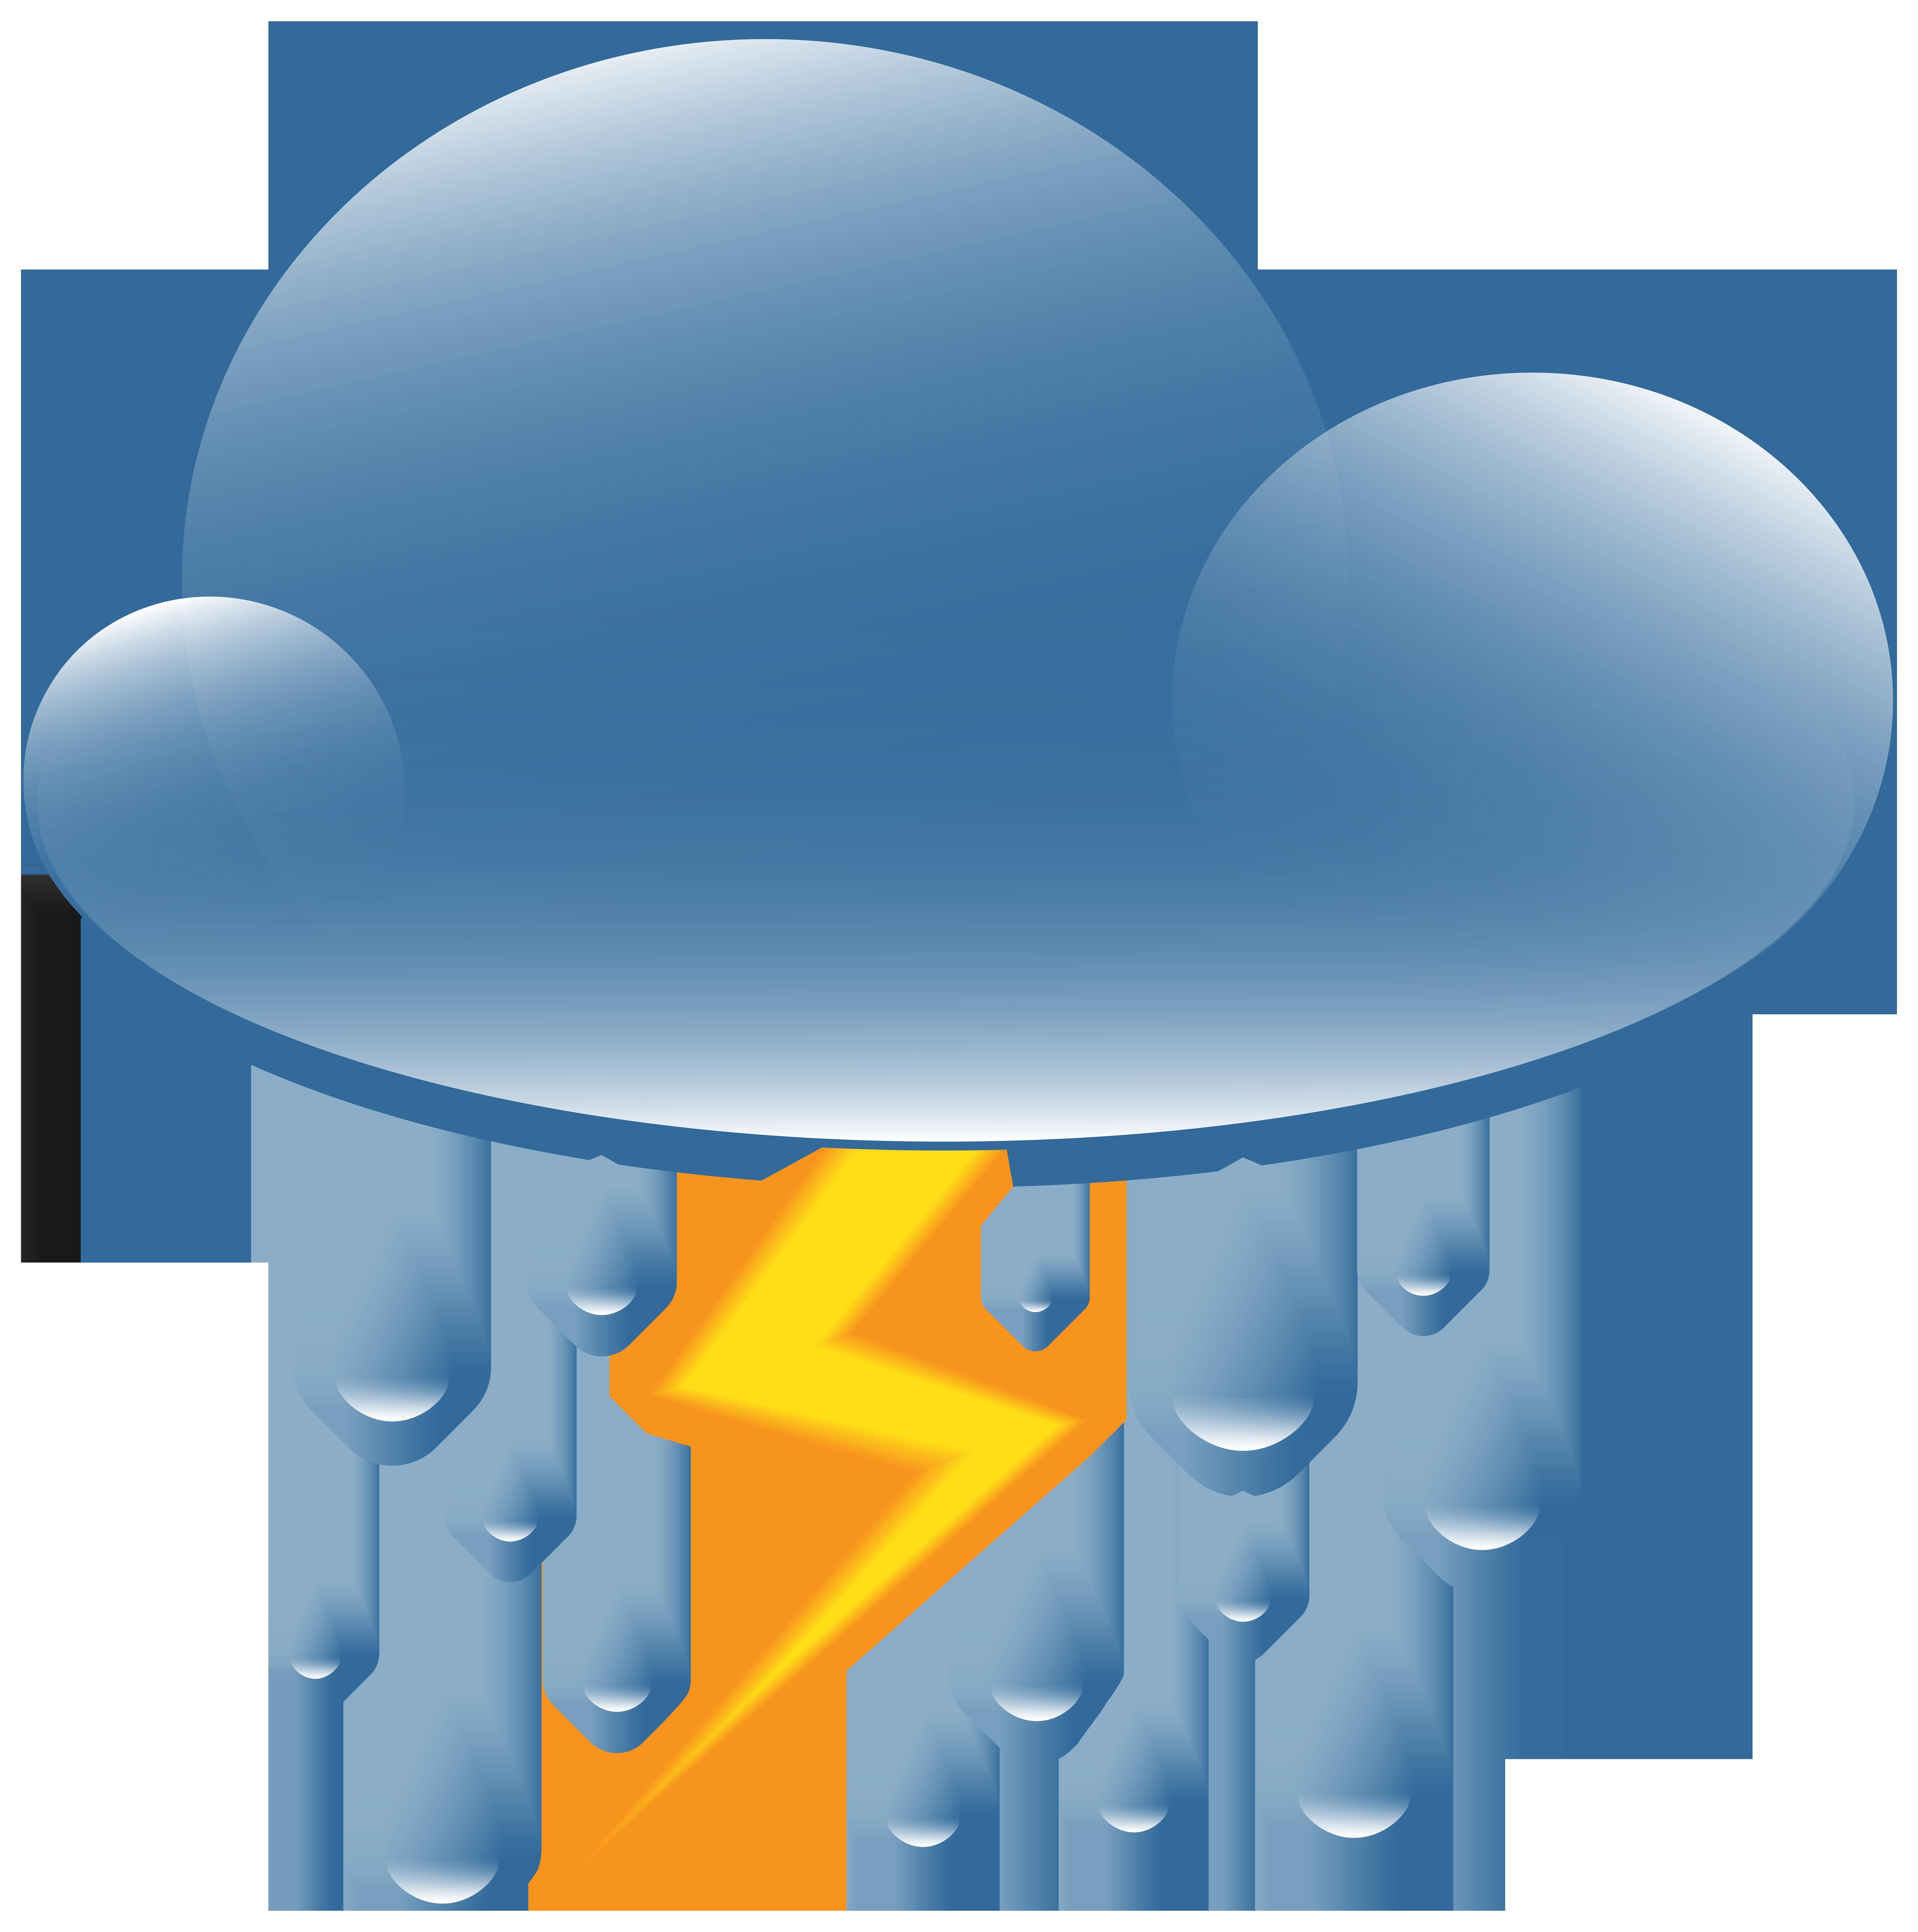 Showering clipart rain shower, Showering rain shower.